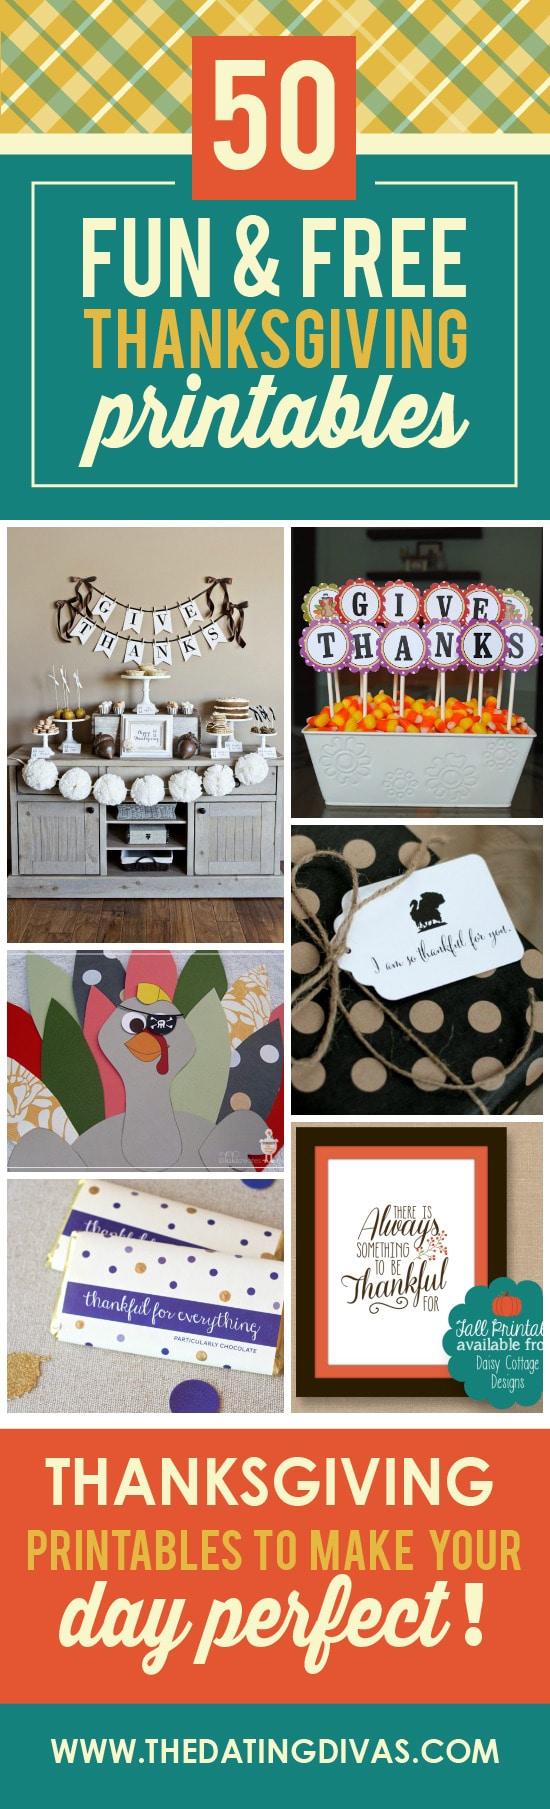 50 fun thanksgiving printables